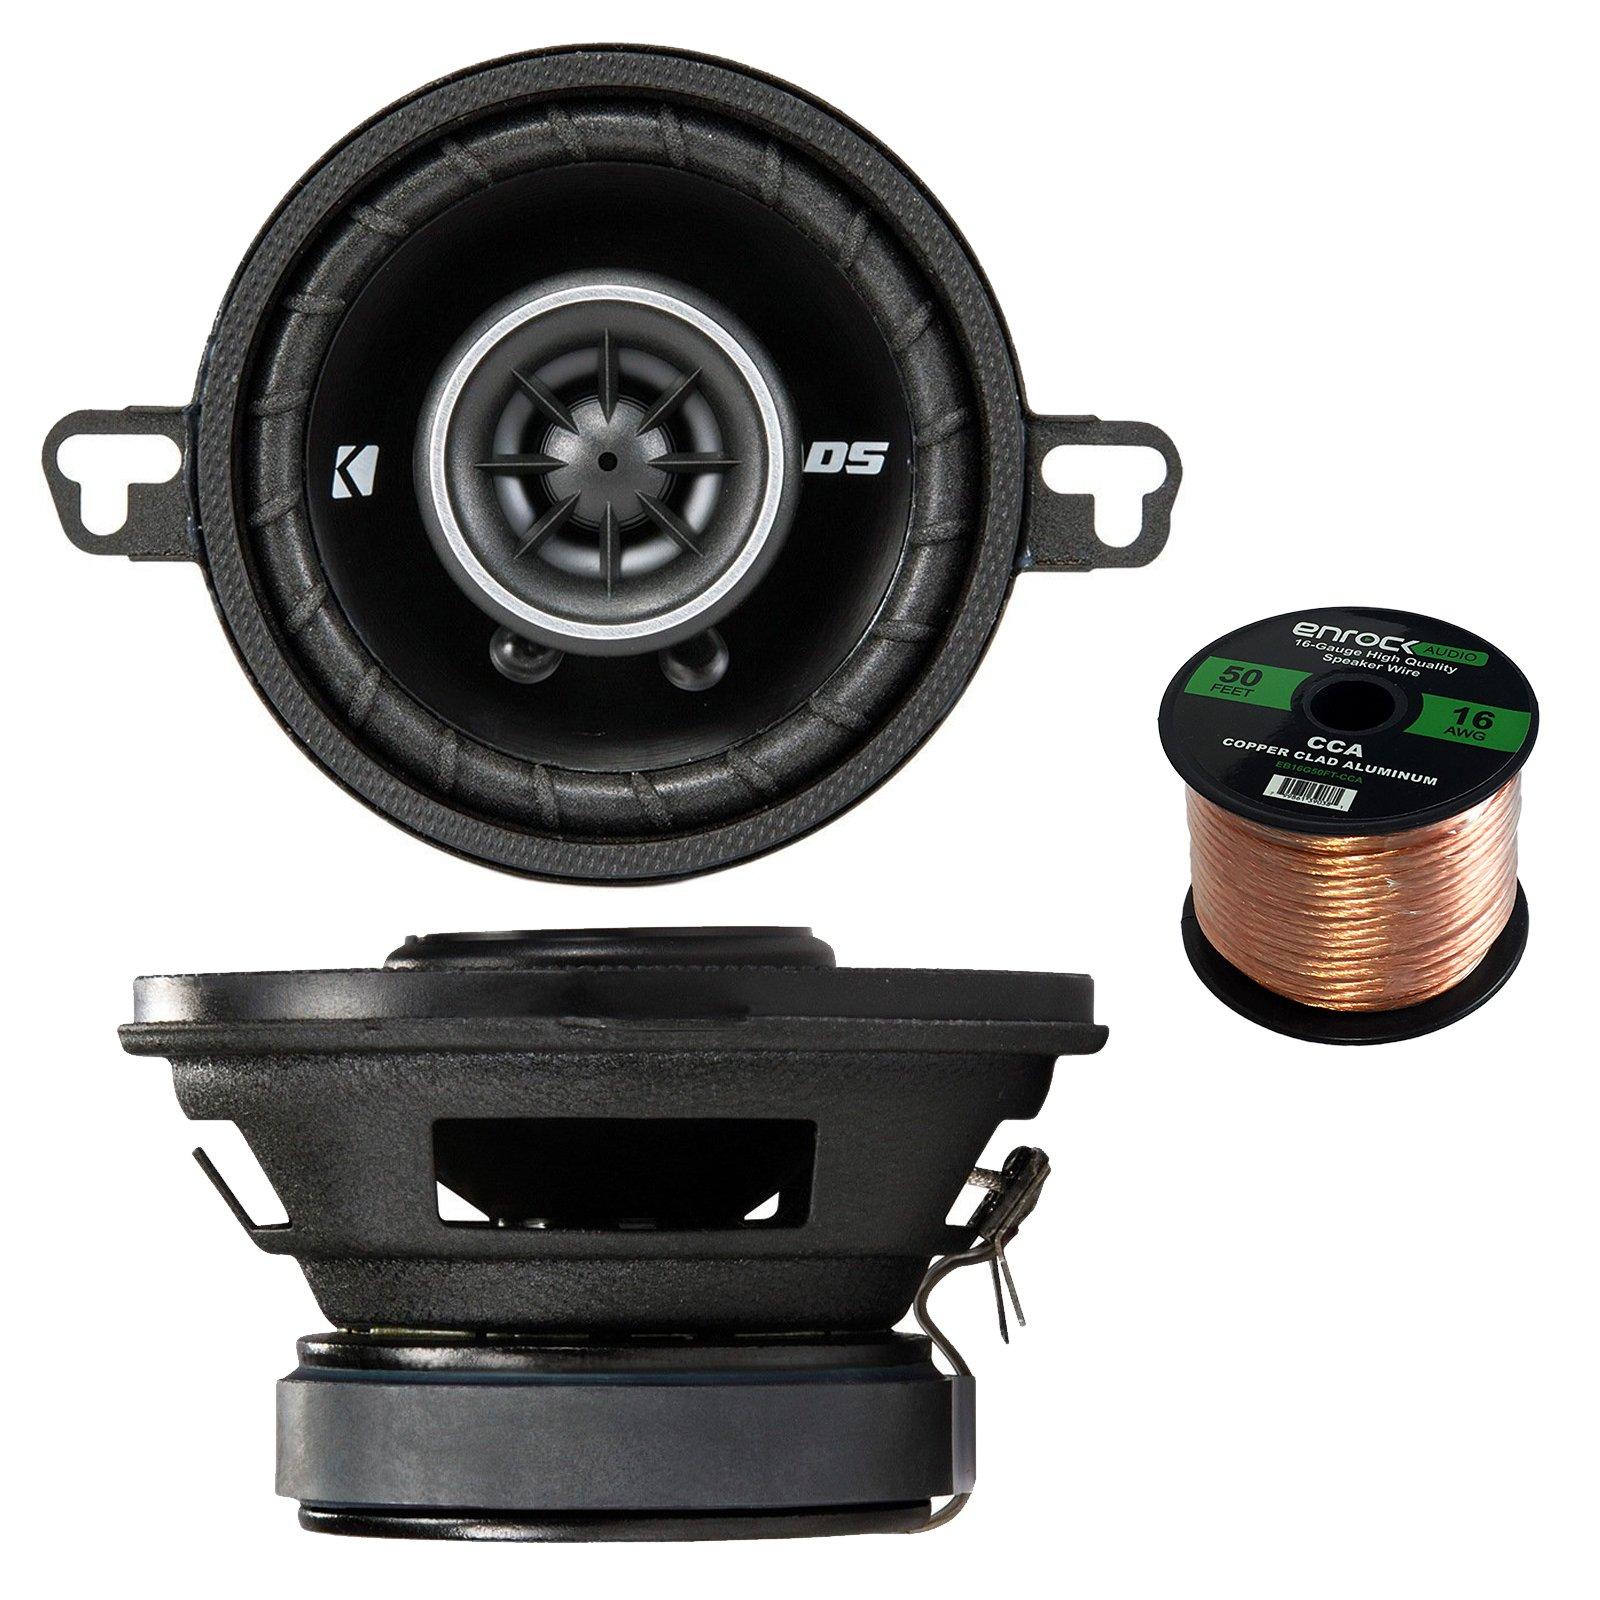 Jensen MS-3ARTL Gauge Style Marine Waterproof Stereo Bundle Combo W/ 6x JBL MS6510 6.5 Inch Boat Speakers + Jensen 4-Channel Amplifier + Enrock Universal USB / AUX To RCA 10' Extension Cable